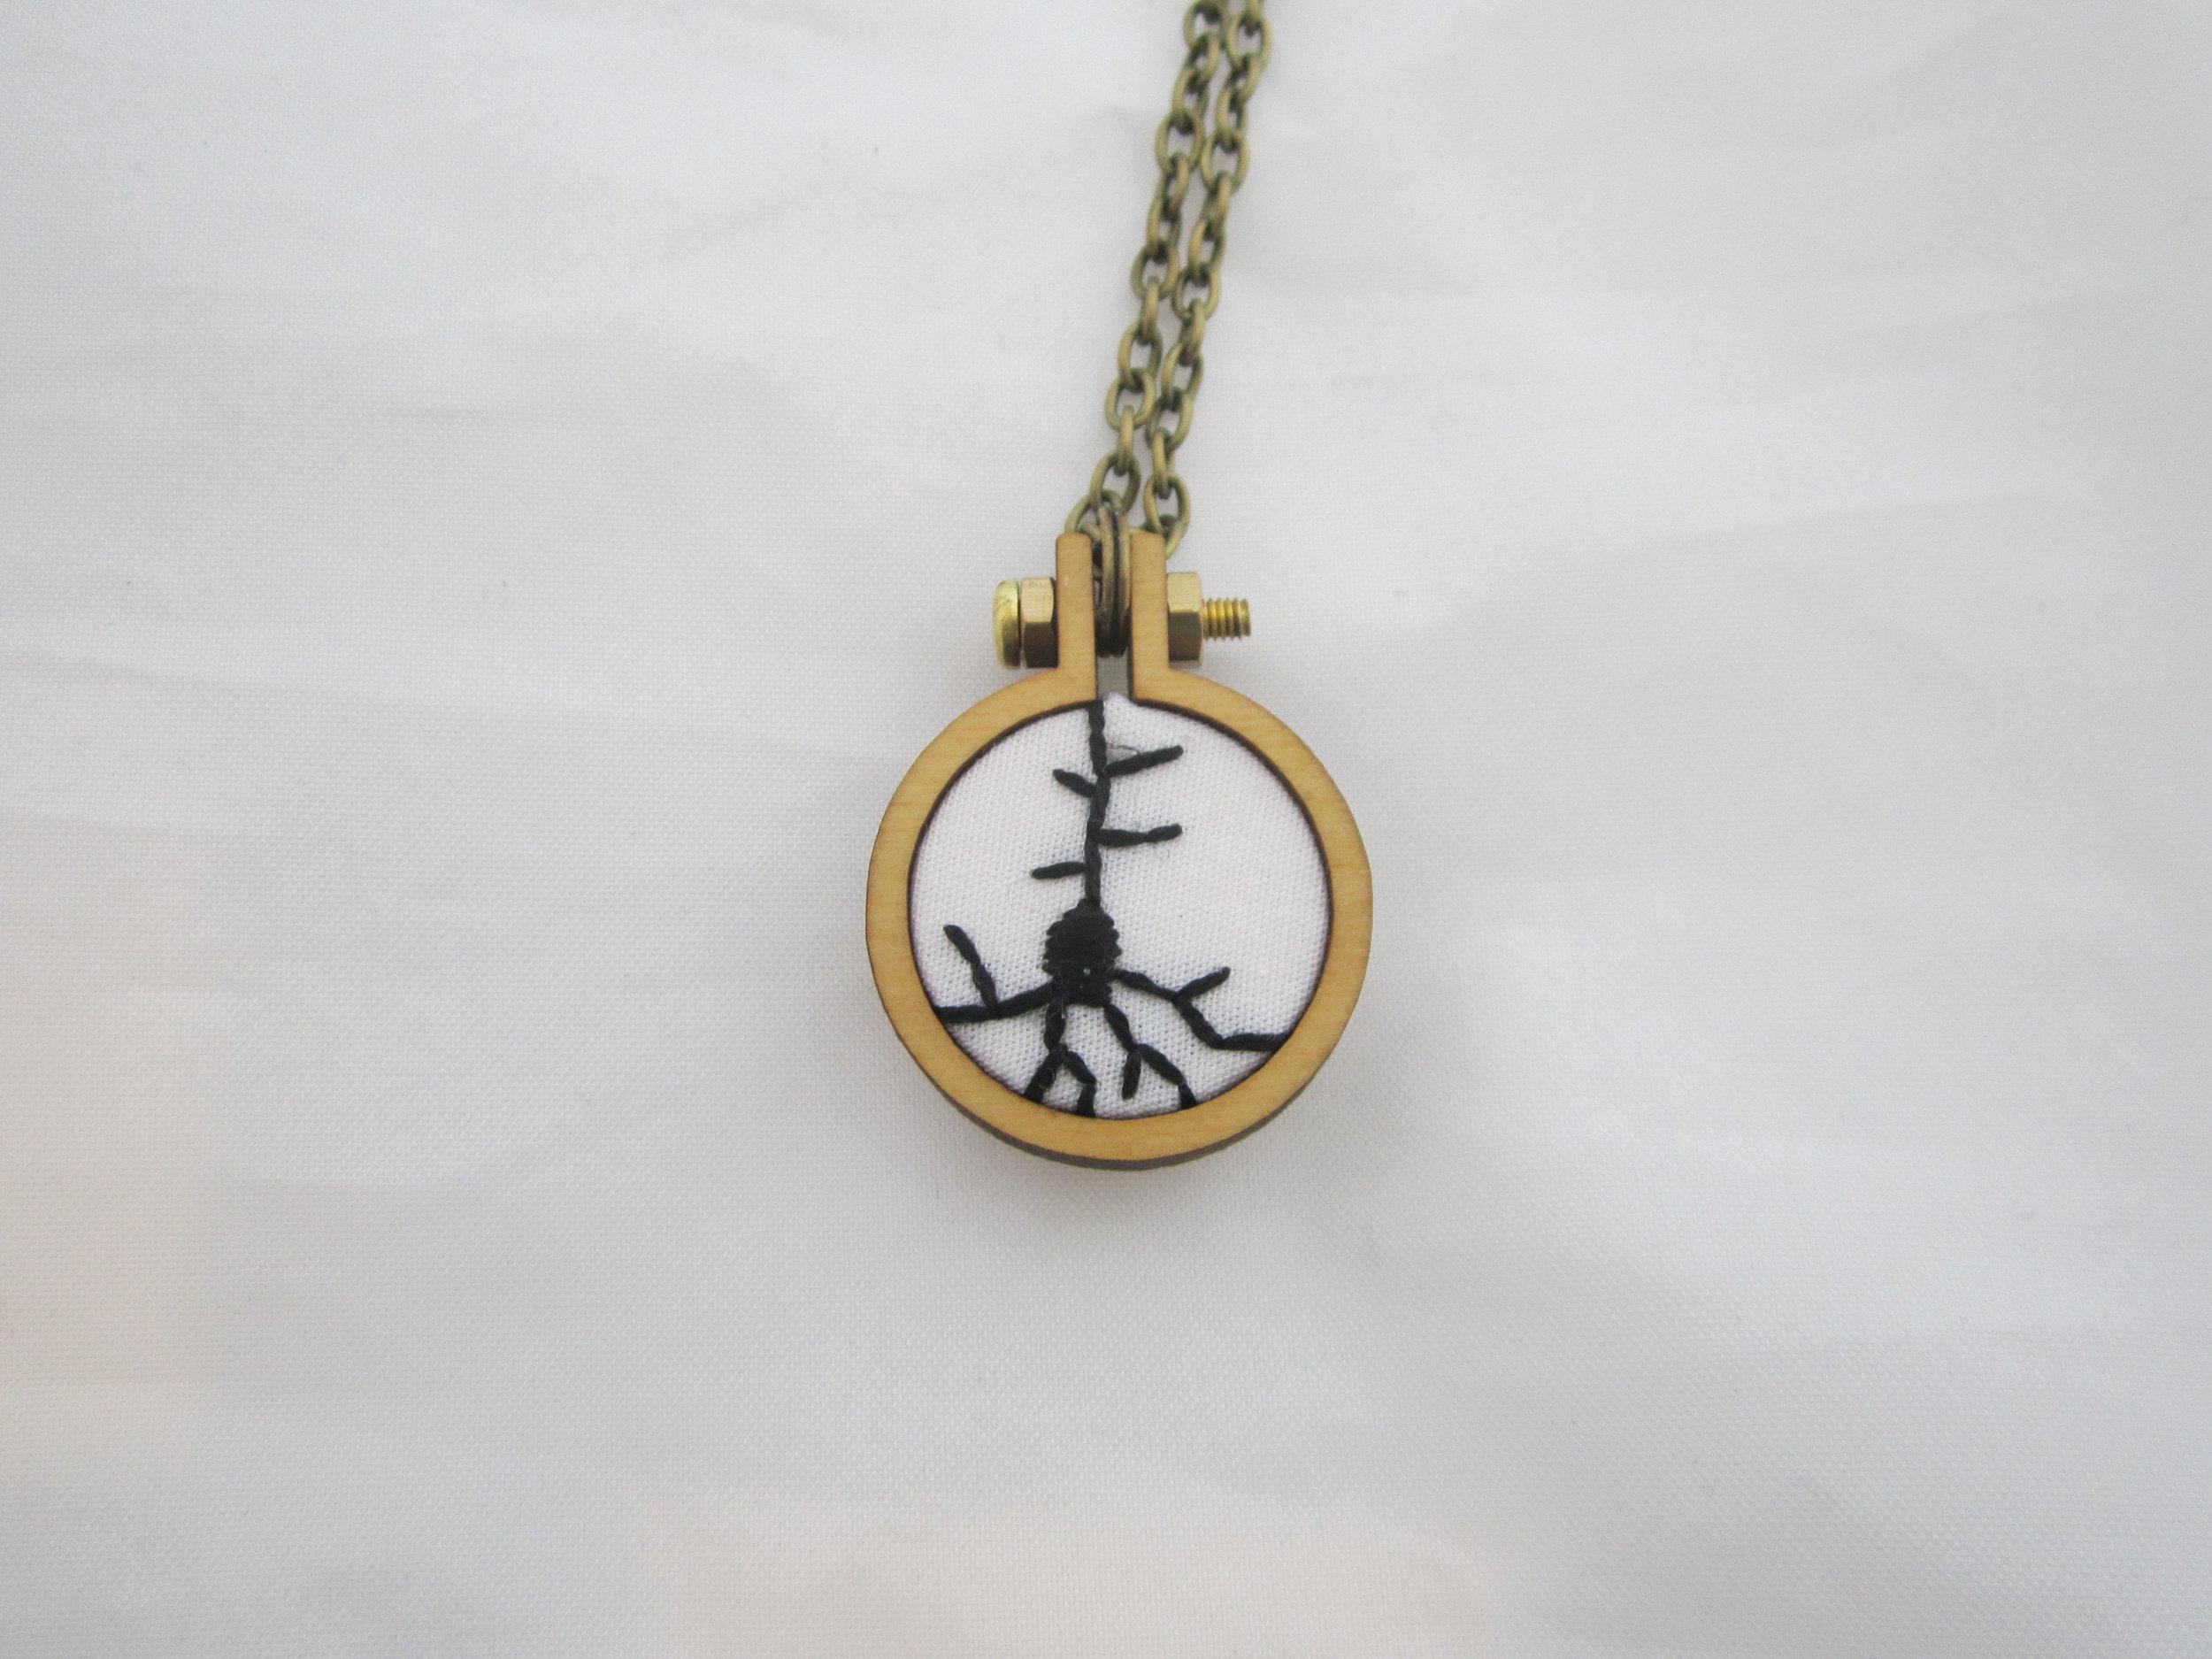 White on Black Neuron Necklace 123016 2.JPG